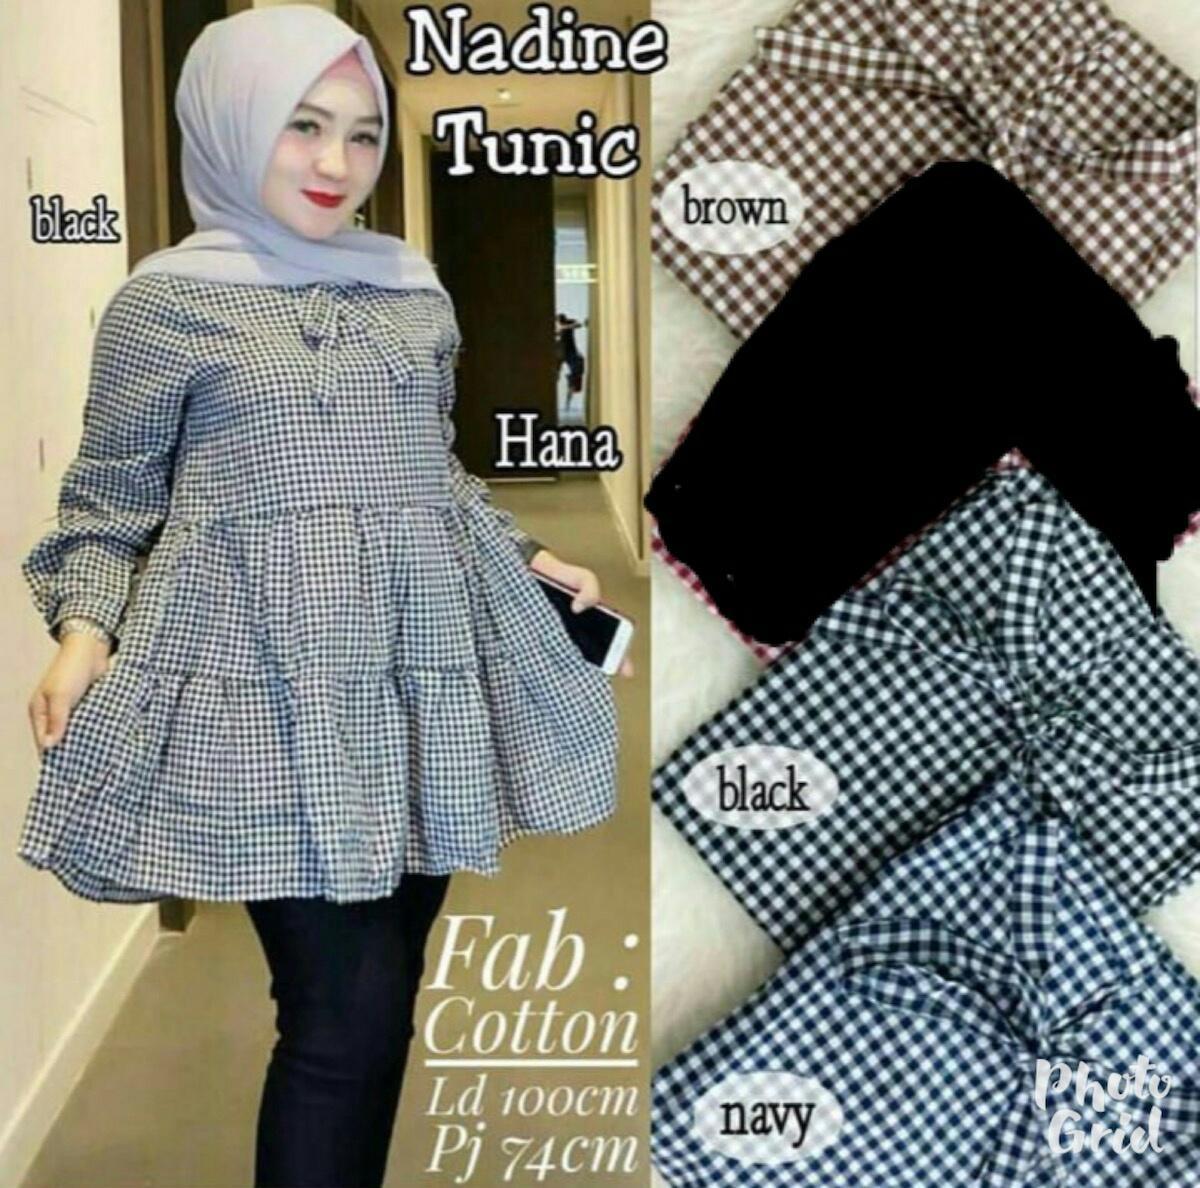 J&C Nadine Tunic / Atasan Tunik / Blouse Muslim / Kemeja Tunik / Tunik Wanita / Atasan Muslim / Baju Muslim / Tunik Katun / Baju Panjang / Hijab Fashion / Hijab Style / Kemeja Casual / Kemeja Jumbo / Kemeja Big Size